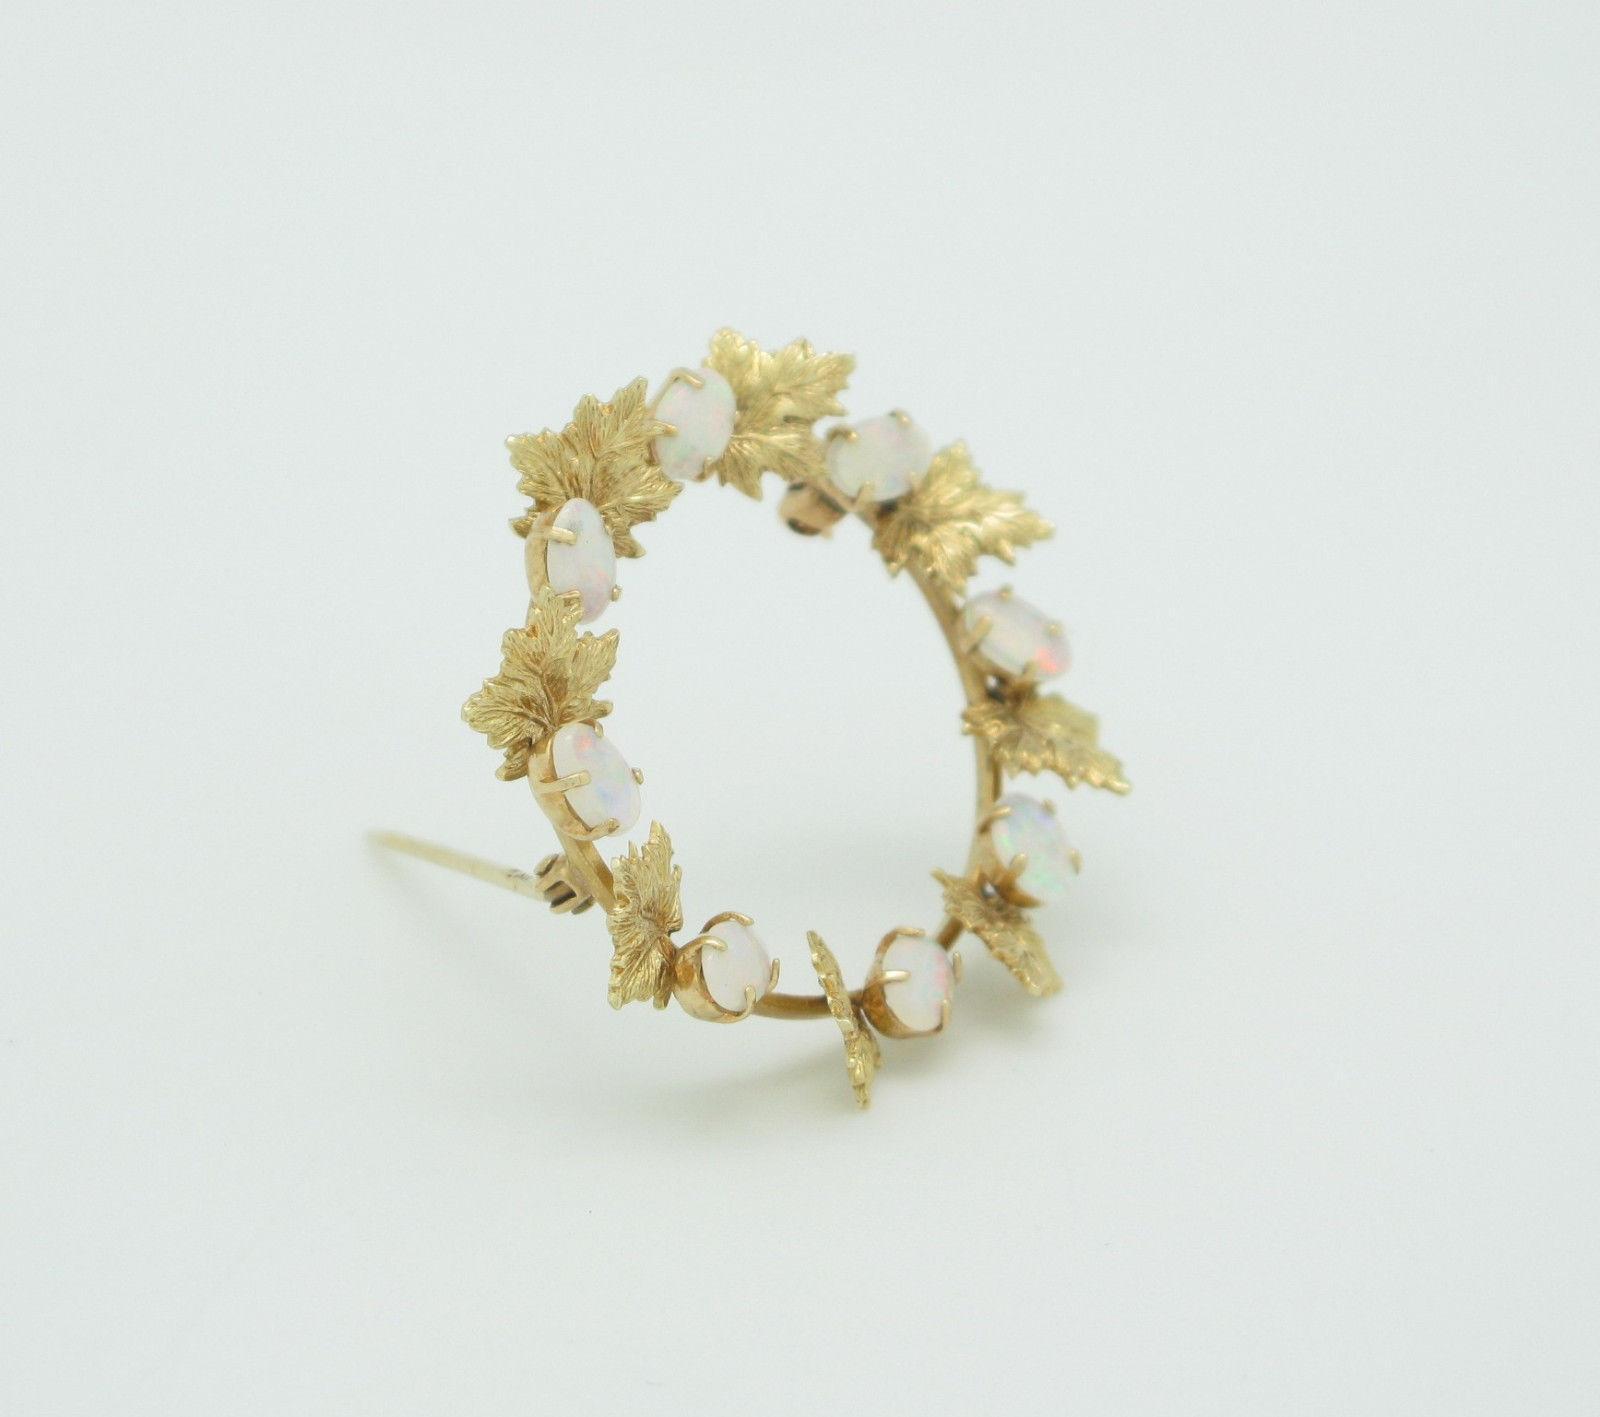 haile jewelry and loans gainesville fl style guru